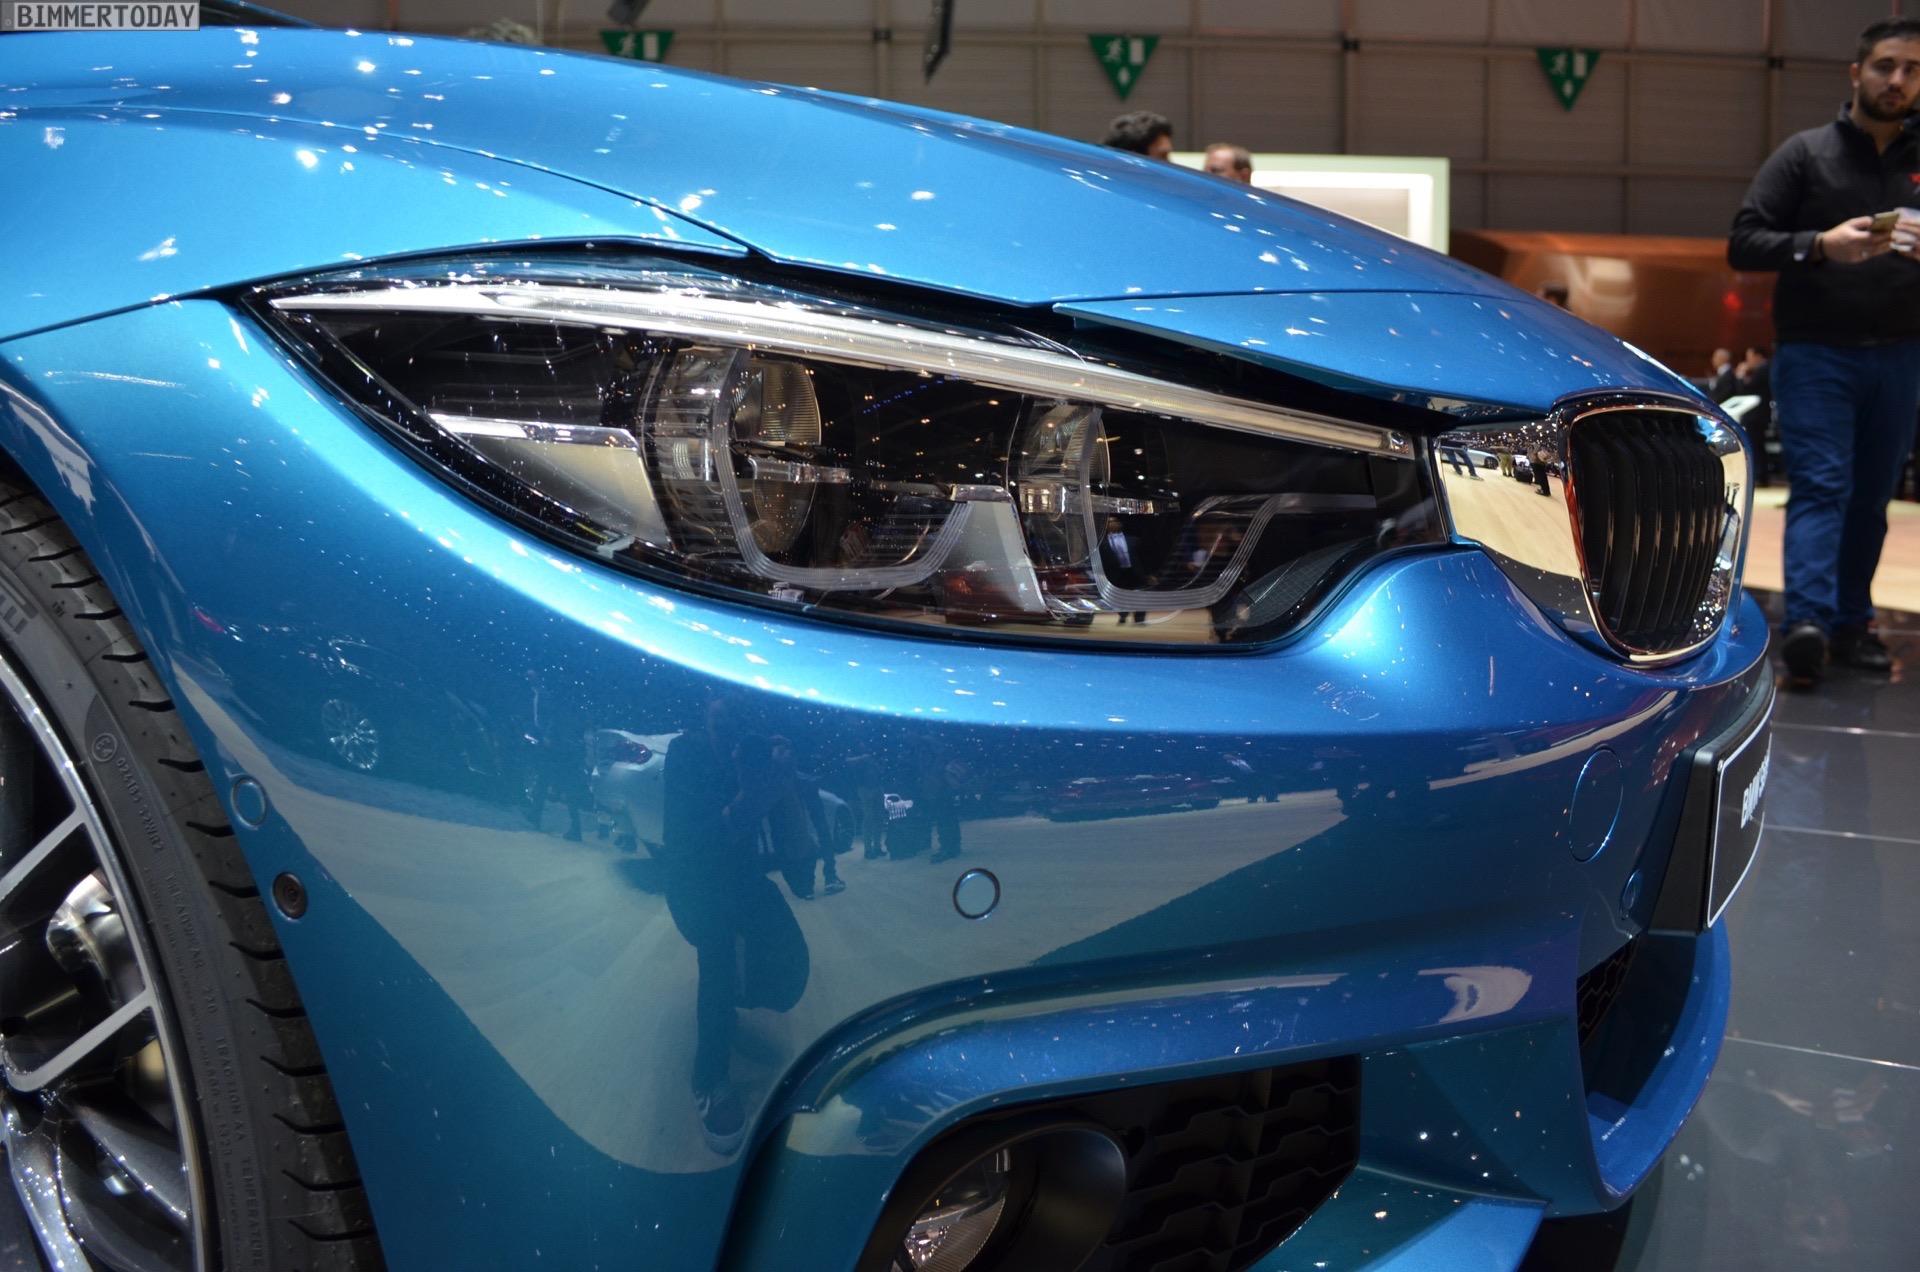 2017 Geneva: BMW 440i Facelift in Snapper Rocks Blue